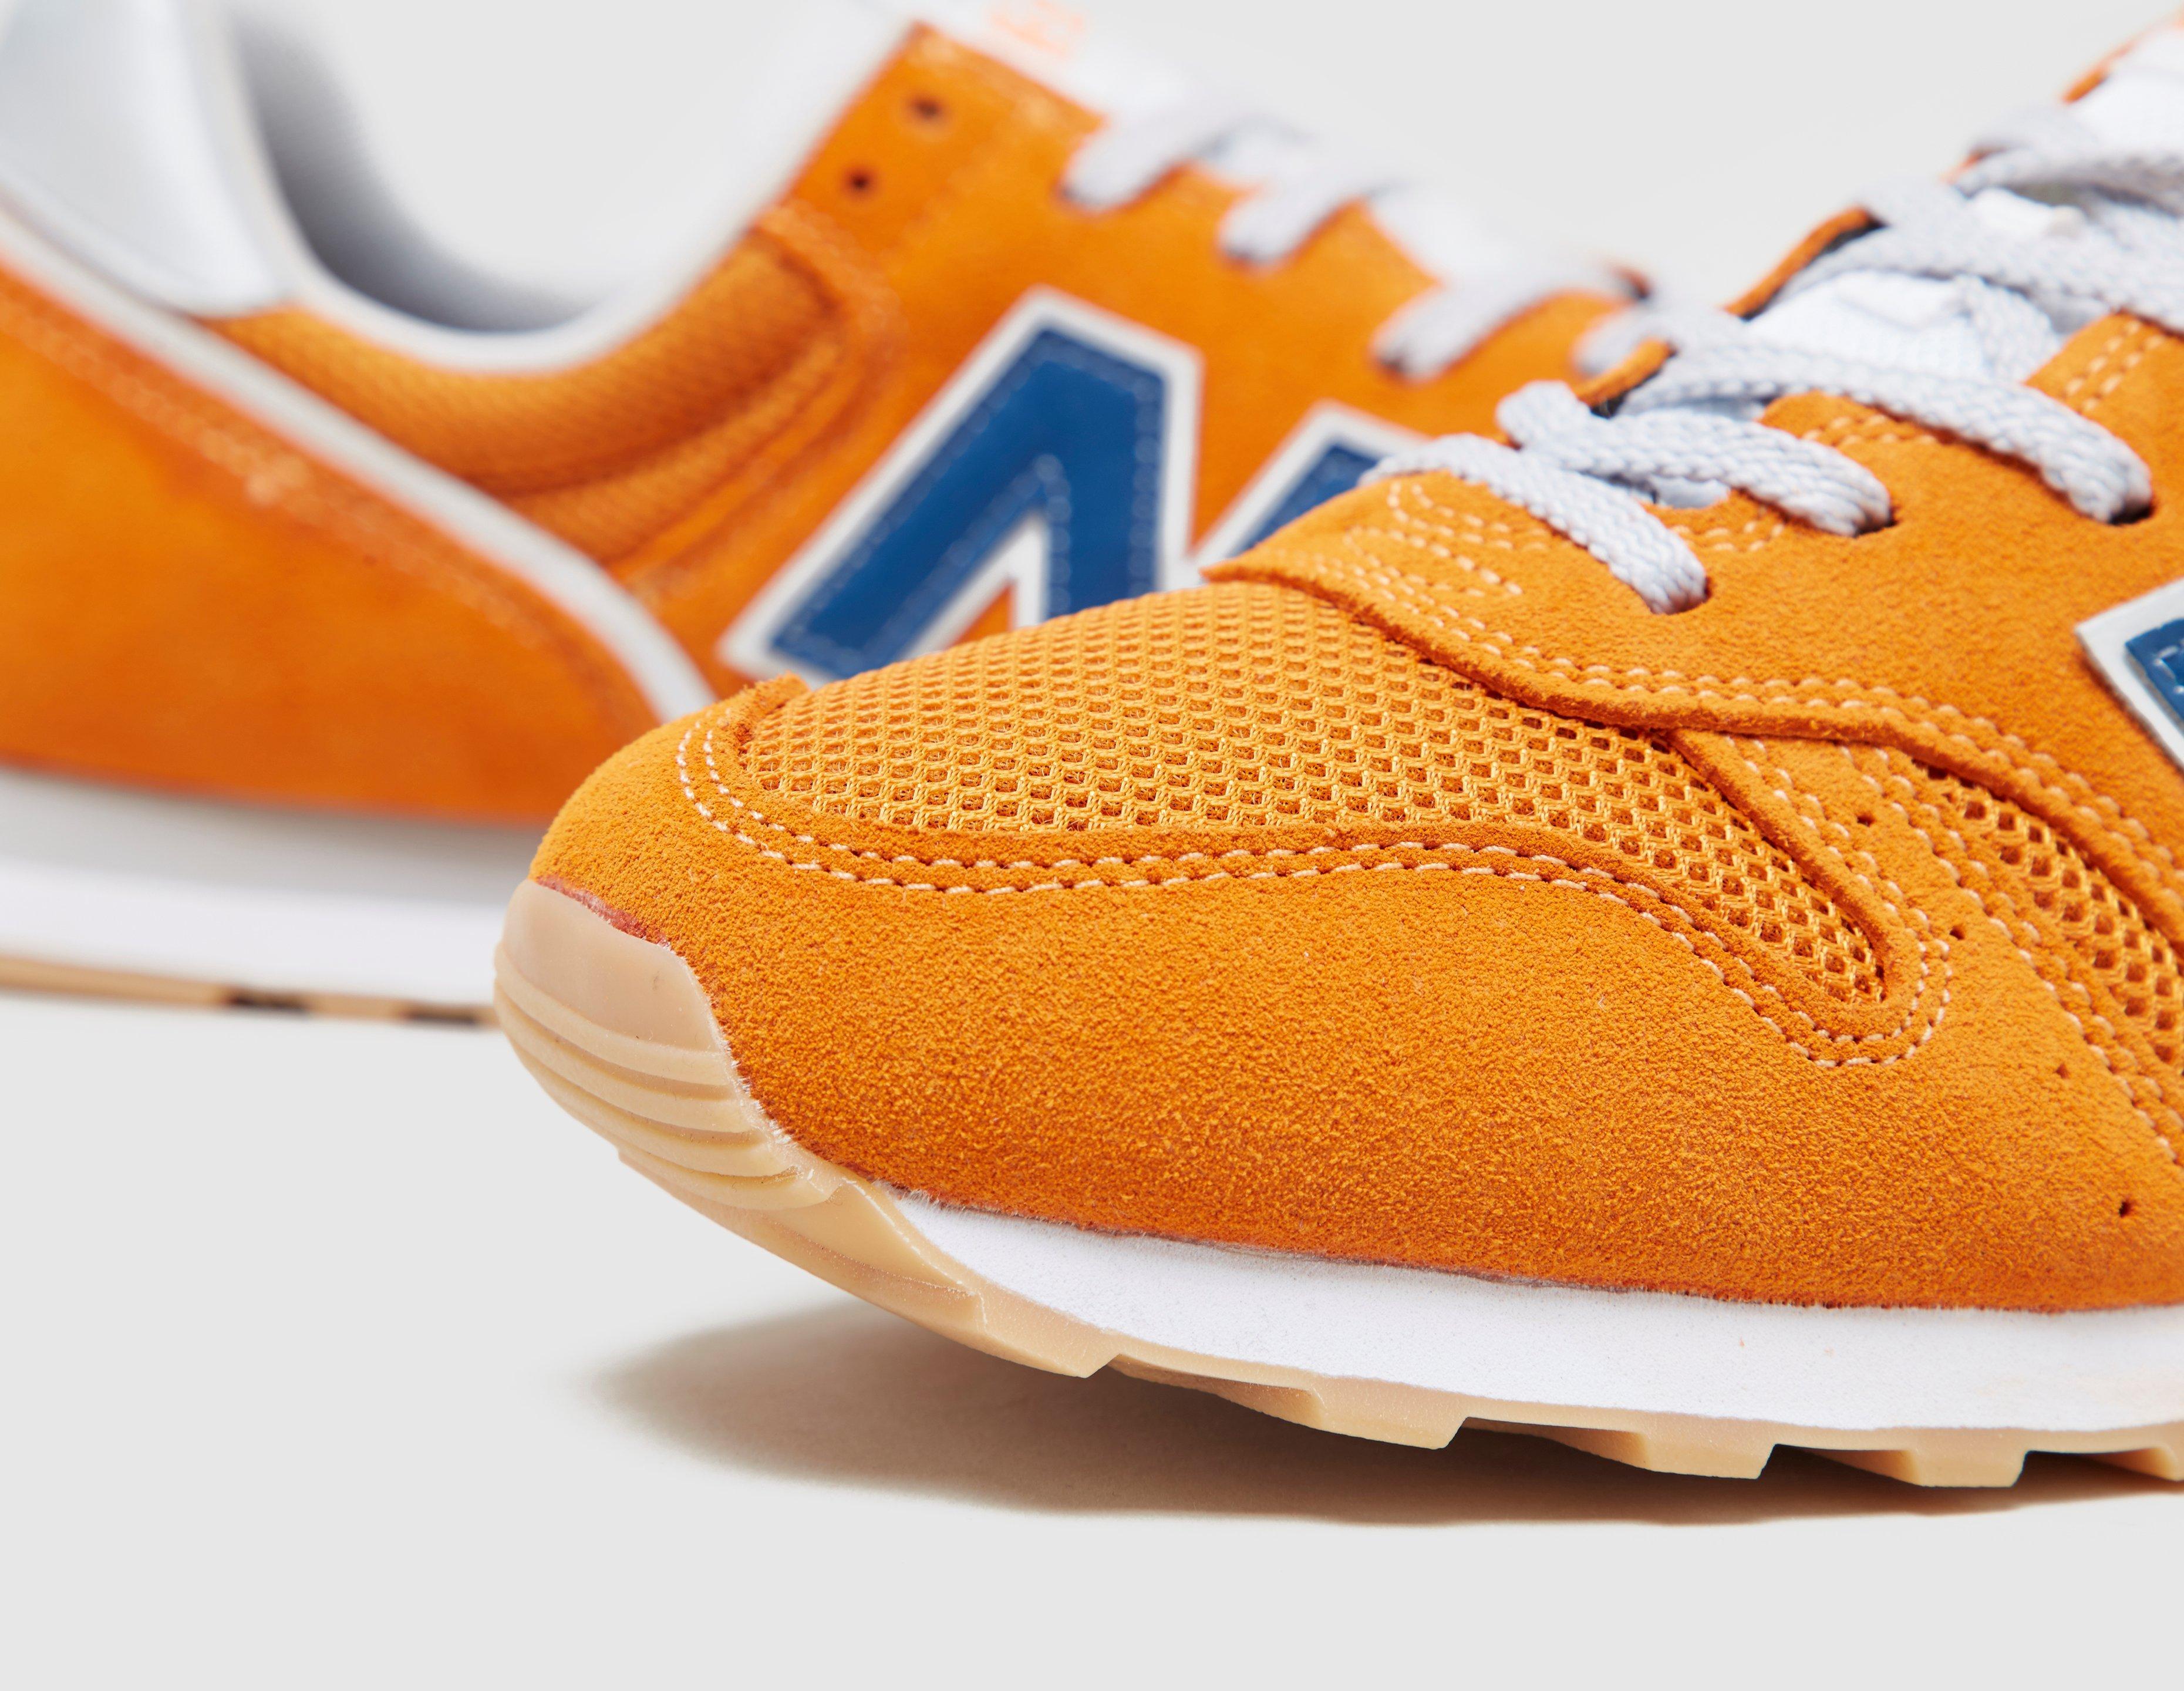 new balance 373 orange Off 63%